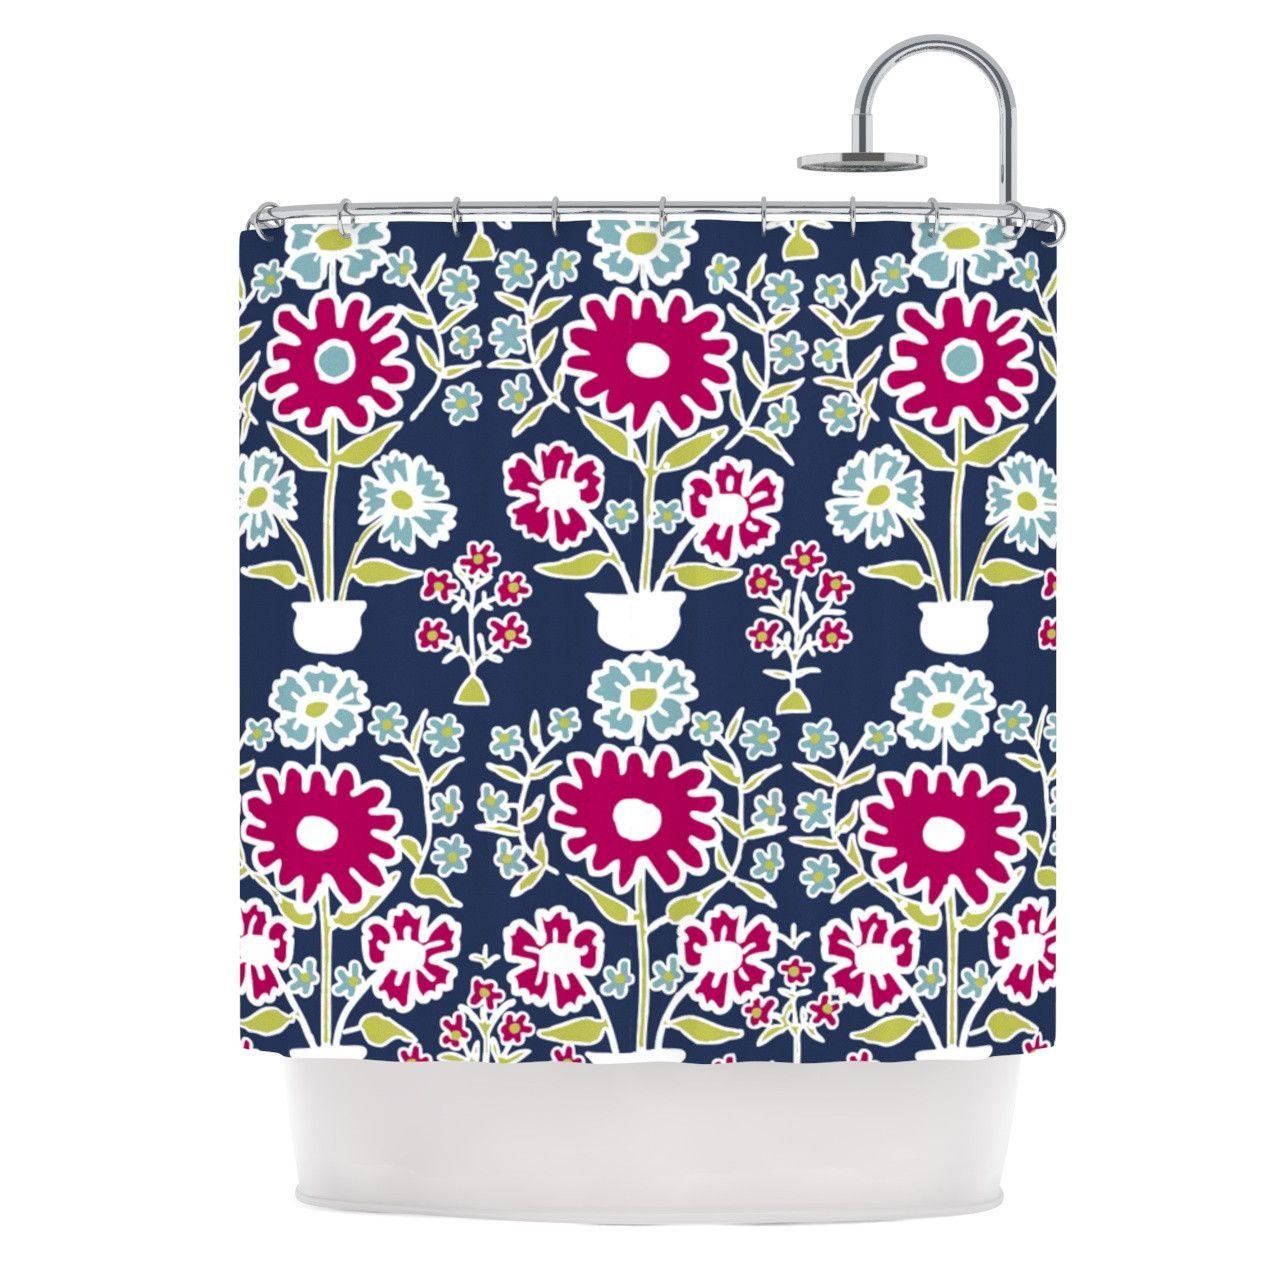 Laura Nicholson Turkish Vase Navy Magenta Shower Curtain From KESS InHouse